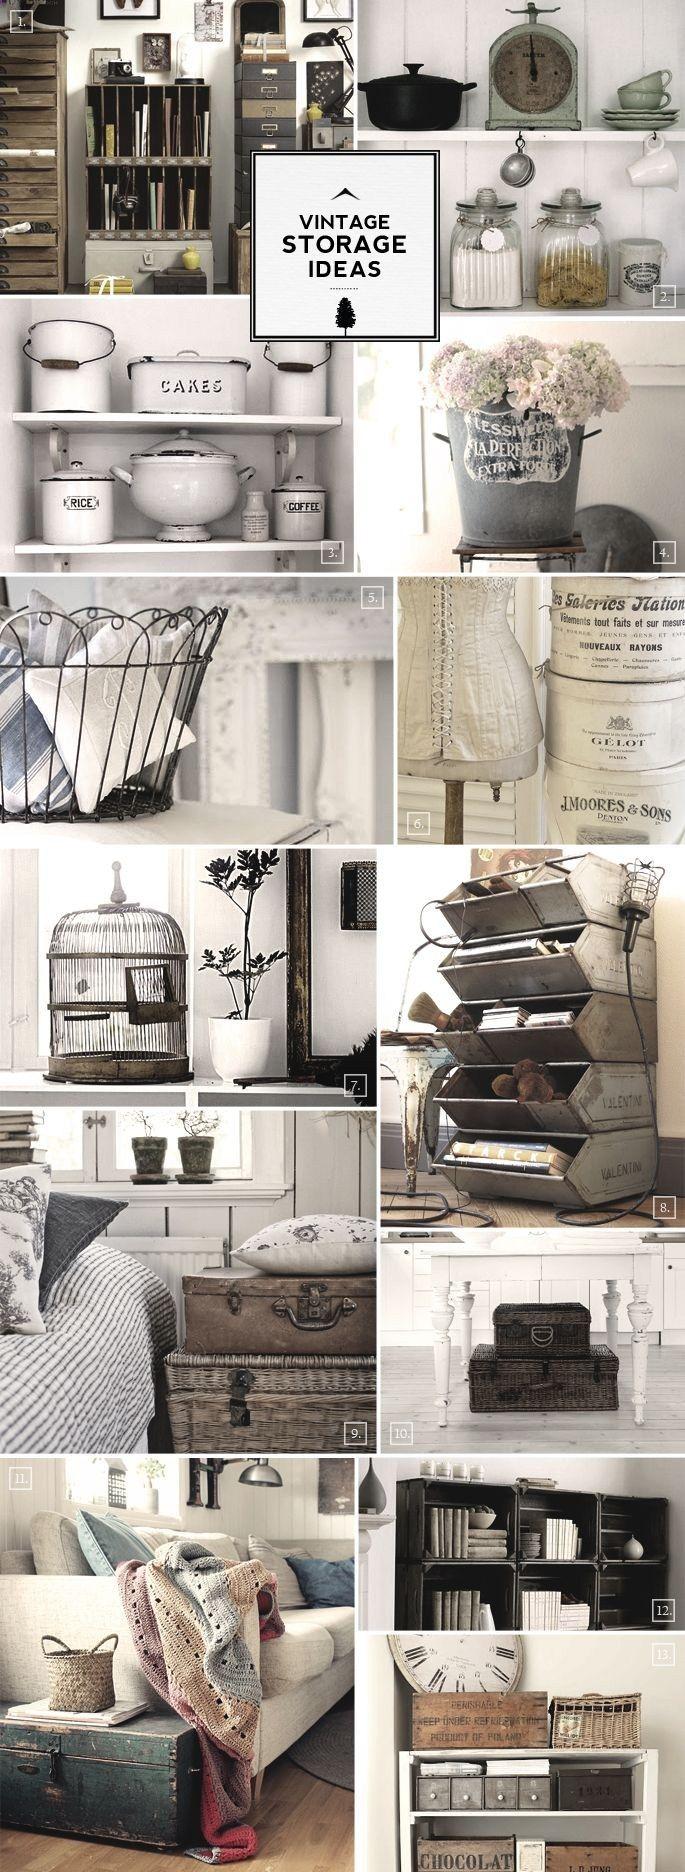 Vintage Storage Ideas - http://myshabbychicdecor.com/vintage-storage-ideas/